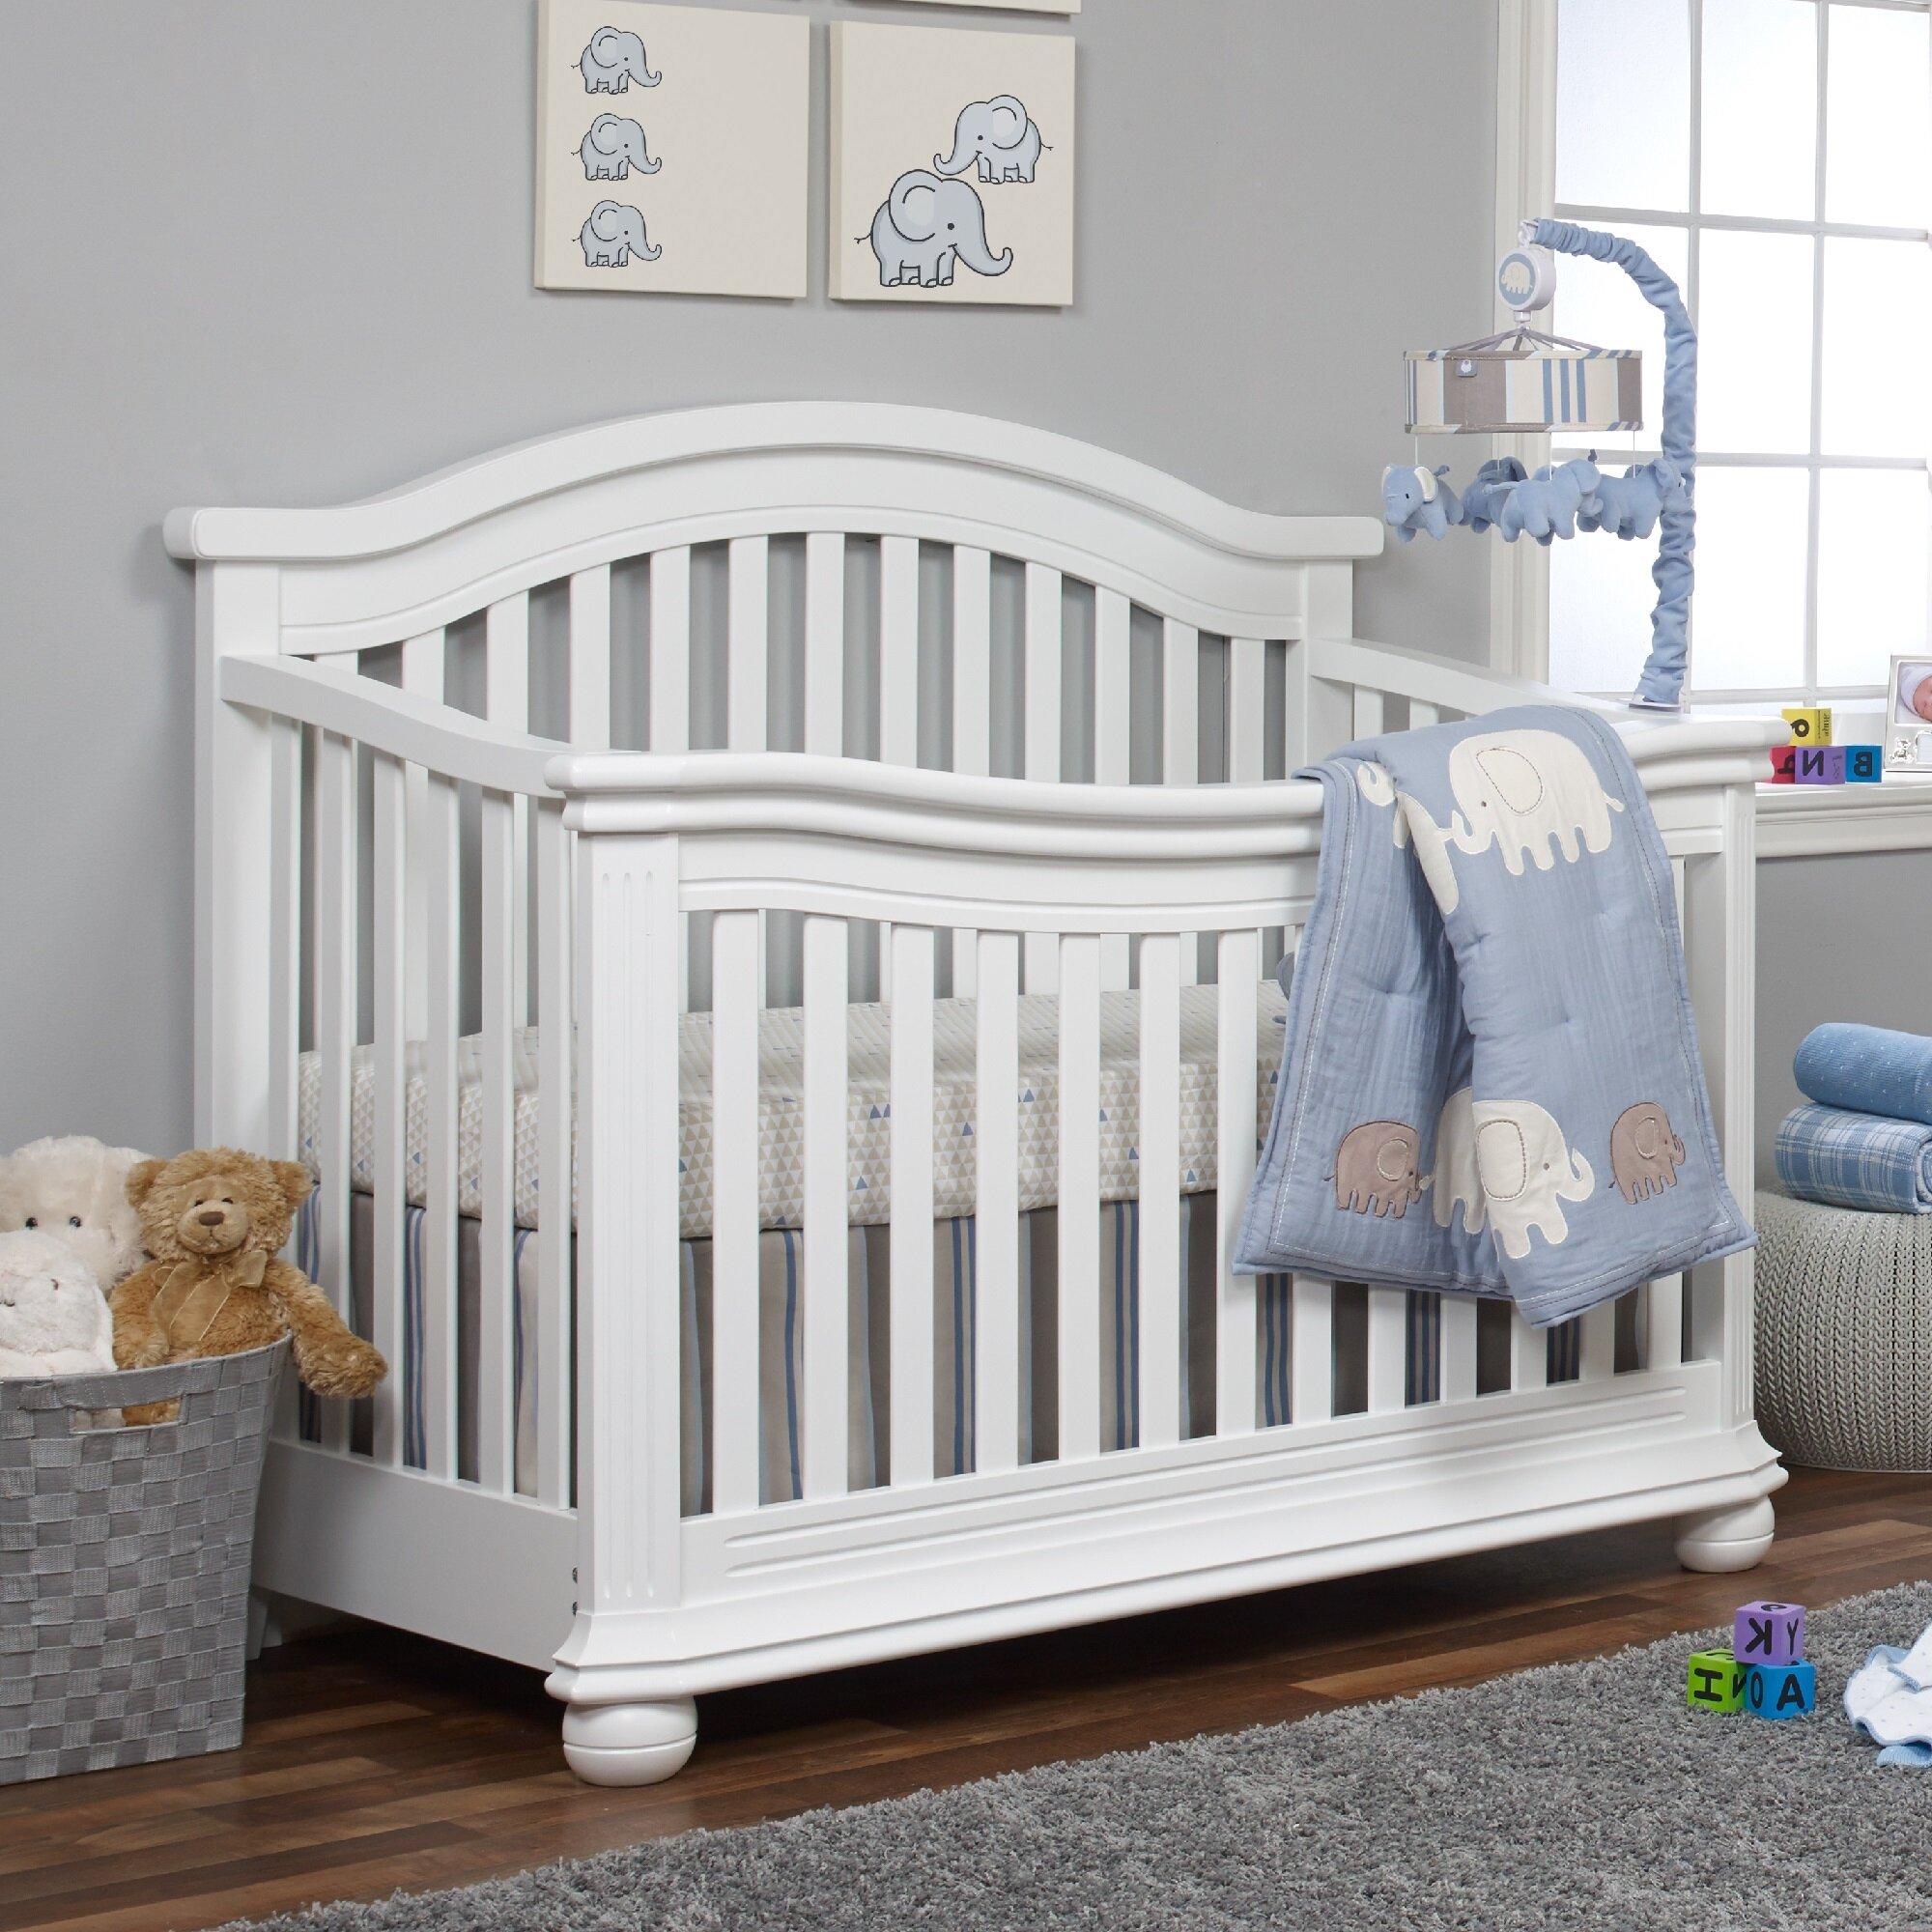 Sorelle vista elite 4-in-1 convertible crib in white | buybuy baby.